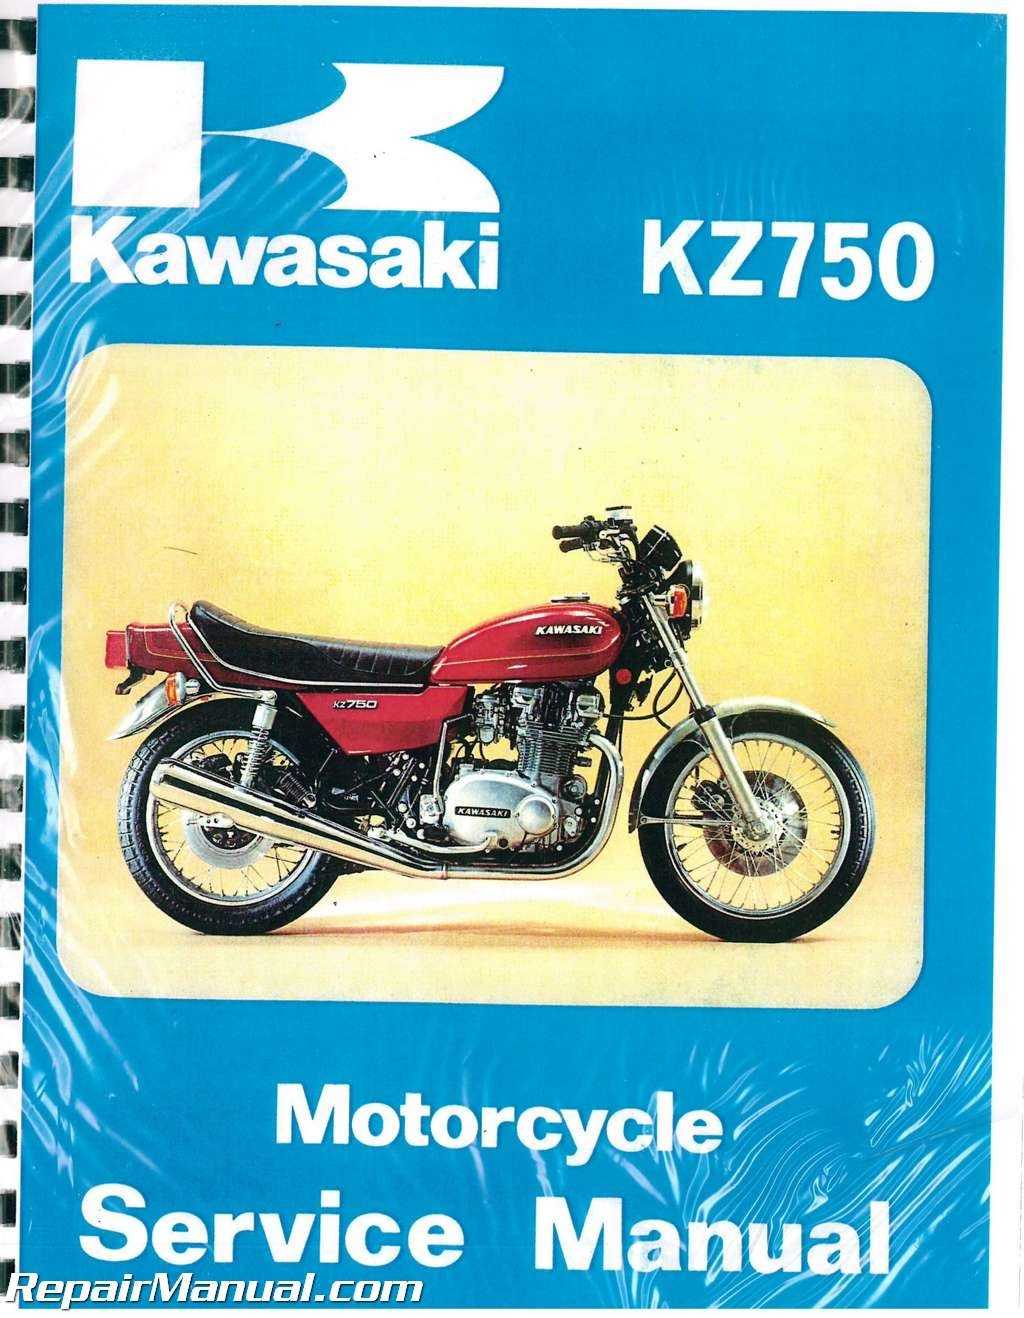 99997-744-04 1976 ? 1979 Kawasaki KZ750 B Twin Motorcycle Service Manual:  Manufacturer: Amazon.com: Books